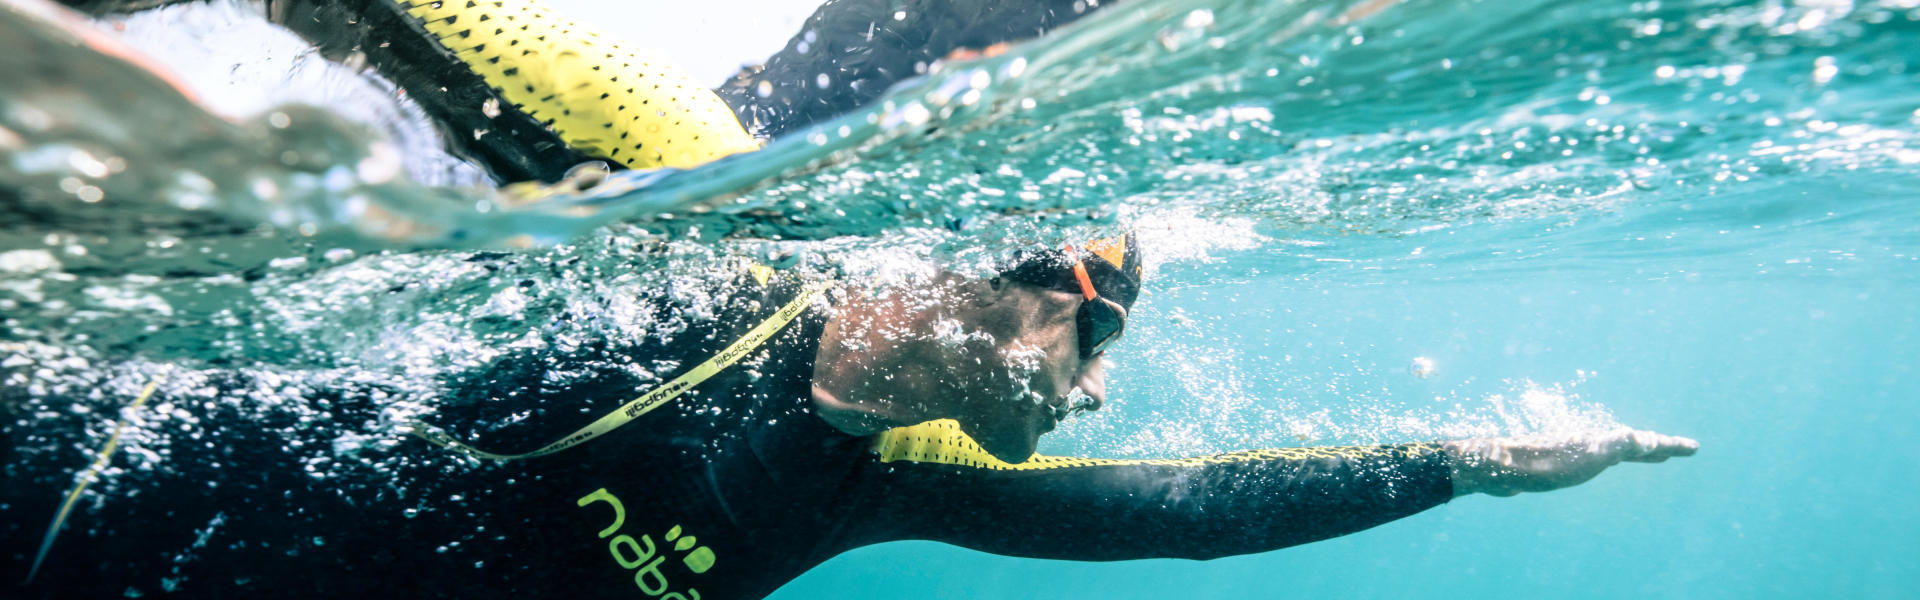 combinaison de natation nage en eau libre